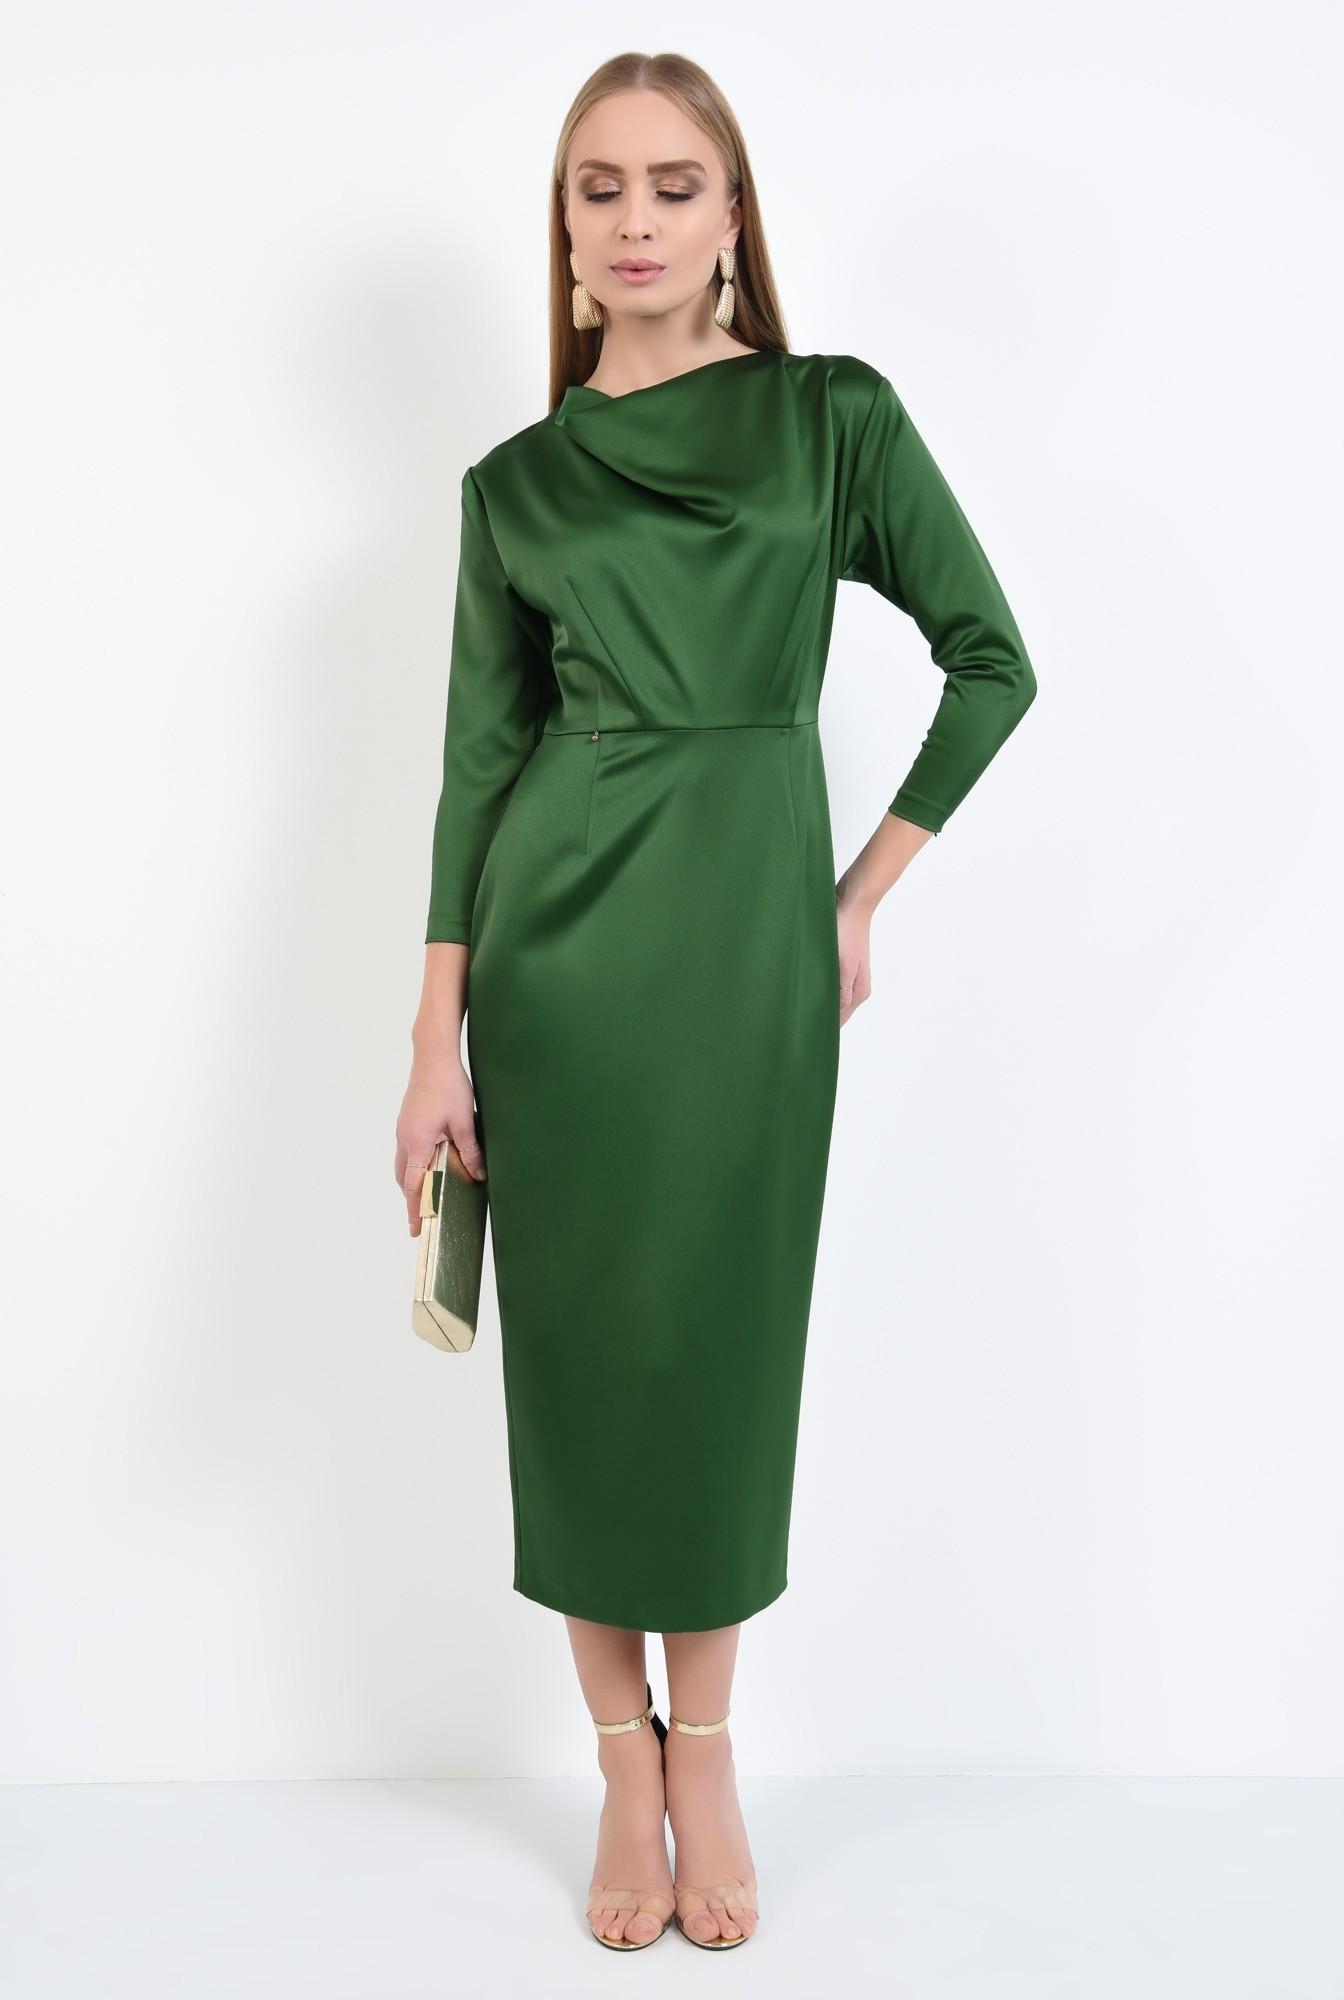 0 - rochie de ocazie, verde, maneci ajustate, drapata la decolteu